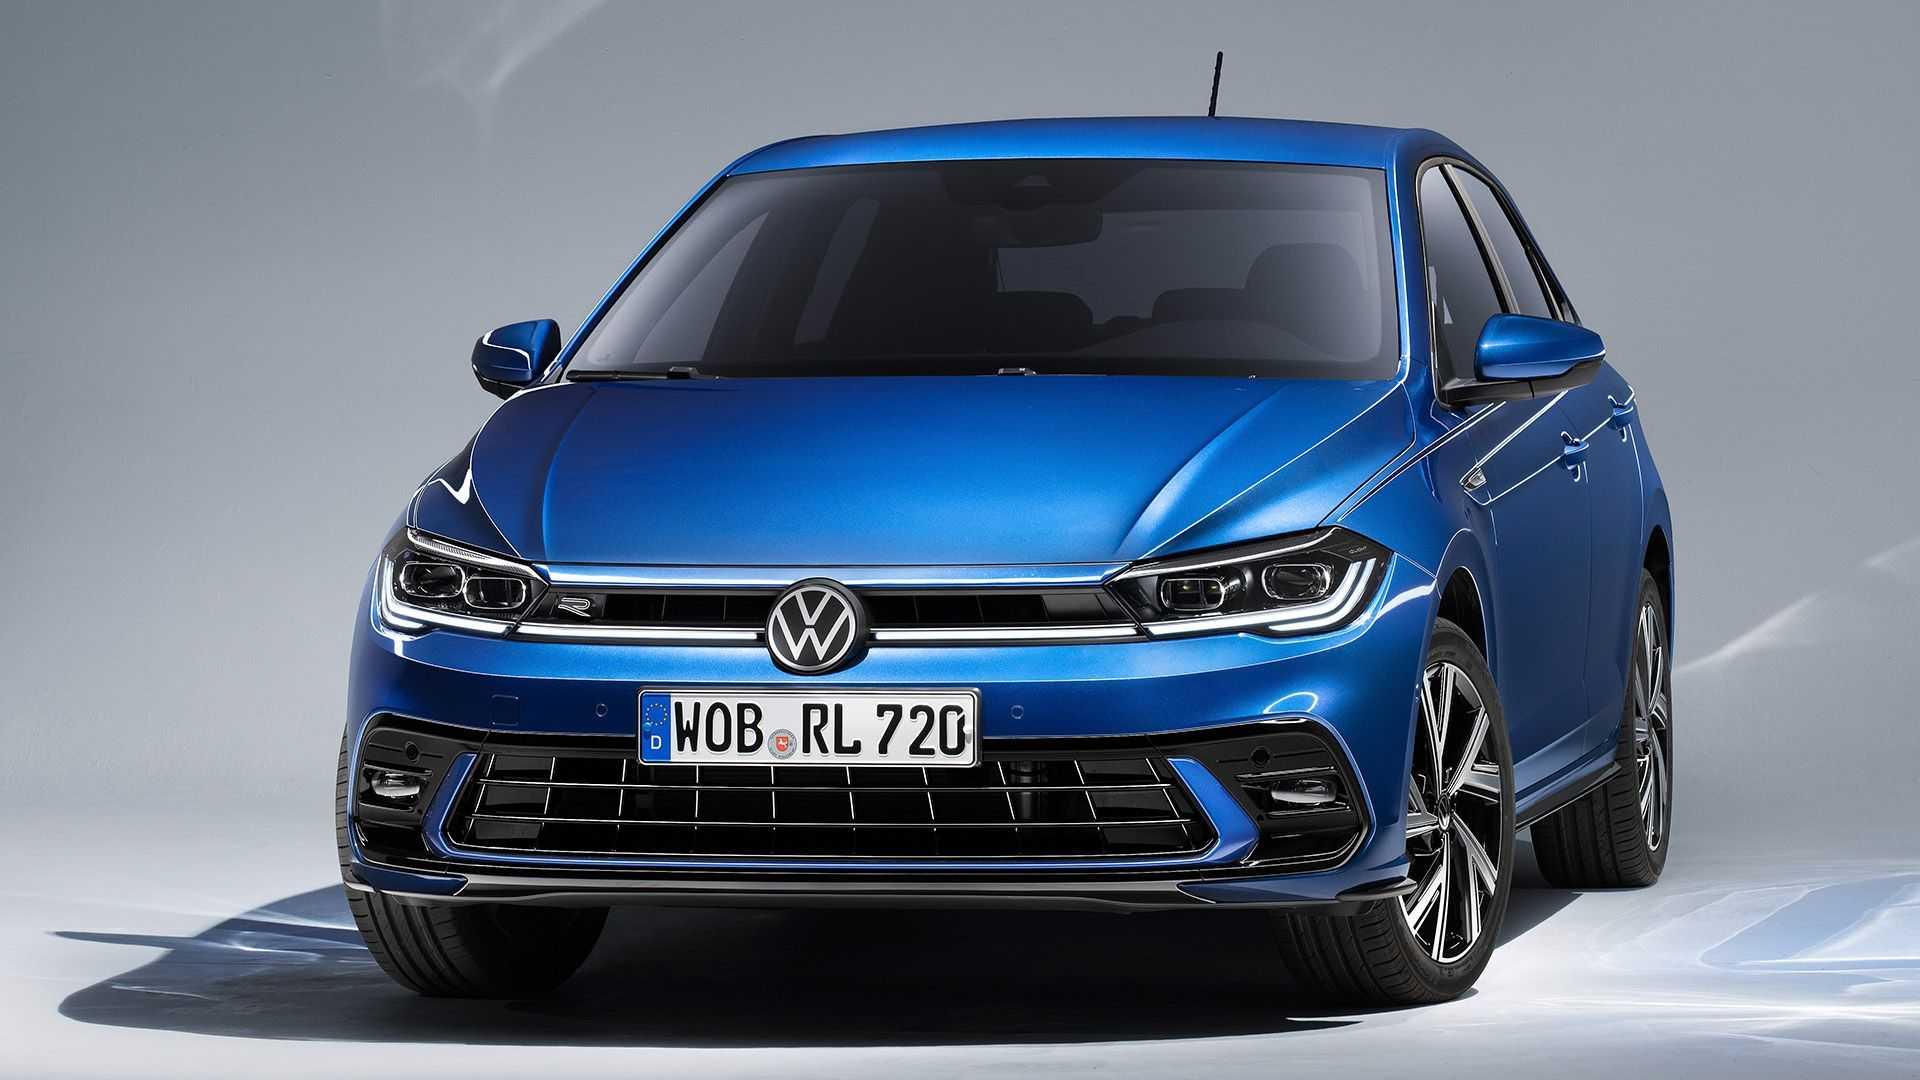 Volkswagen-Polo-facelift-4